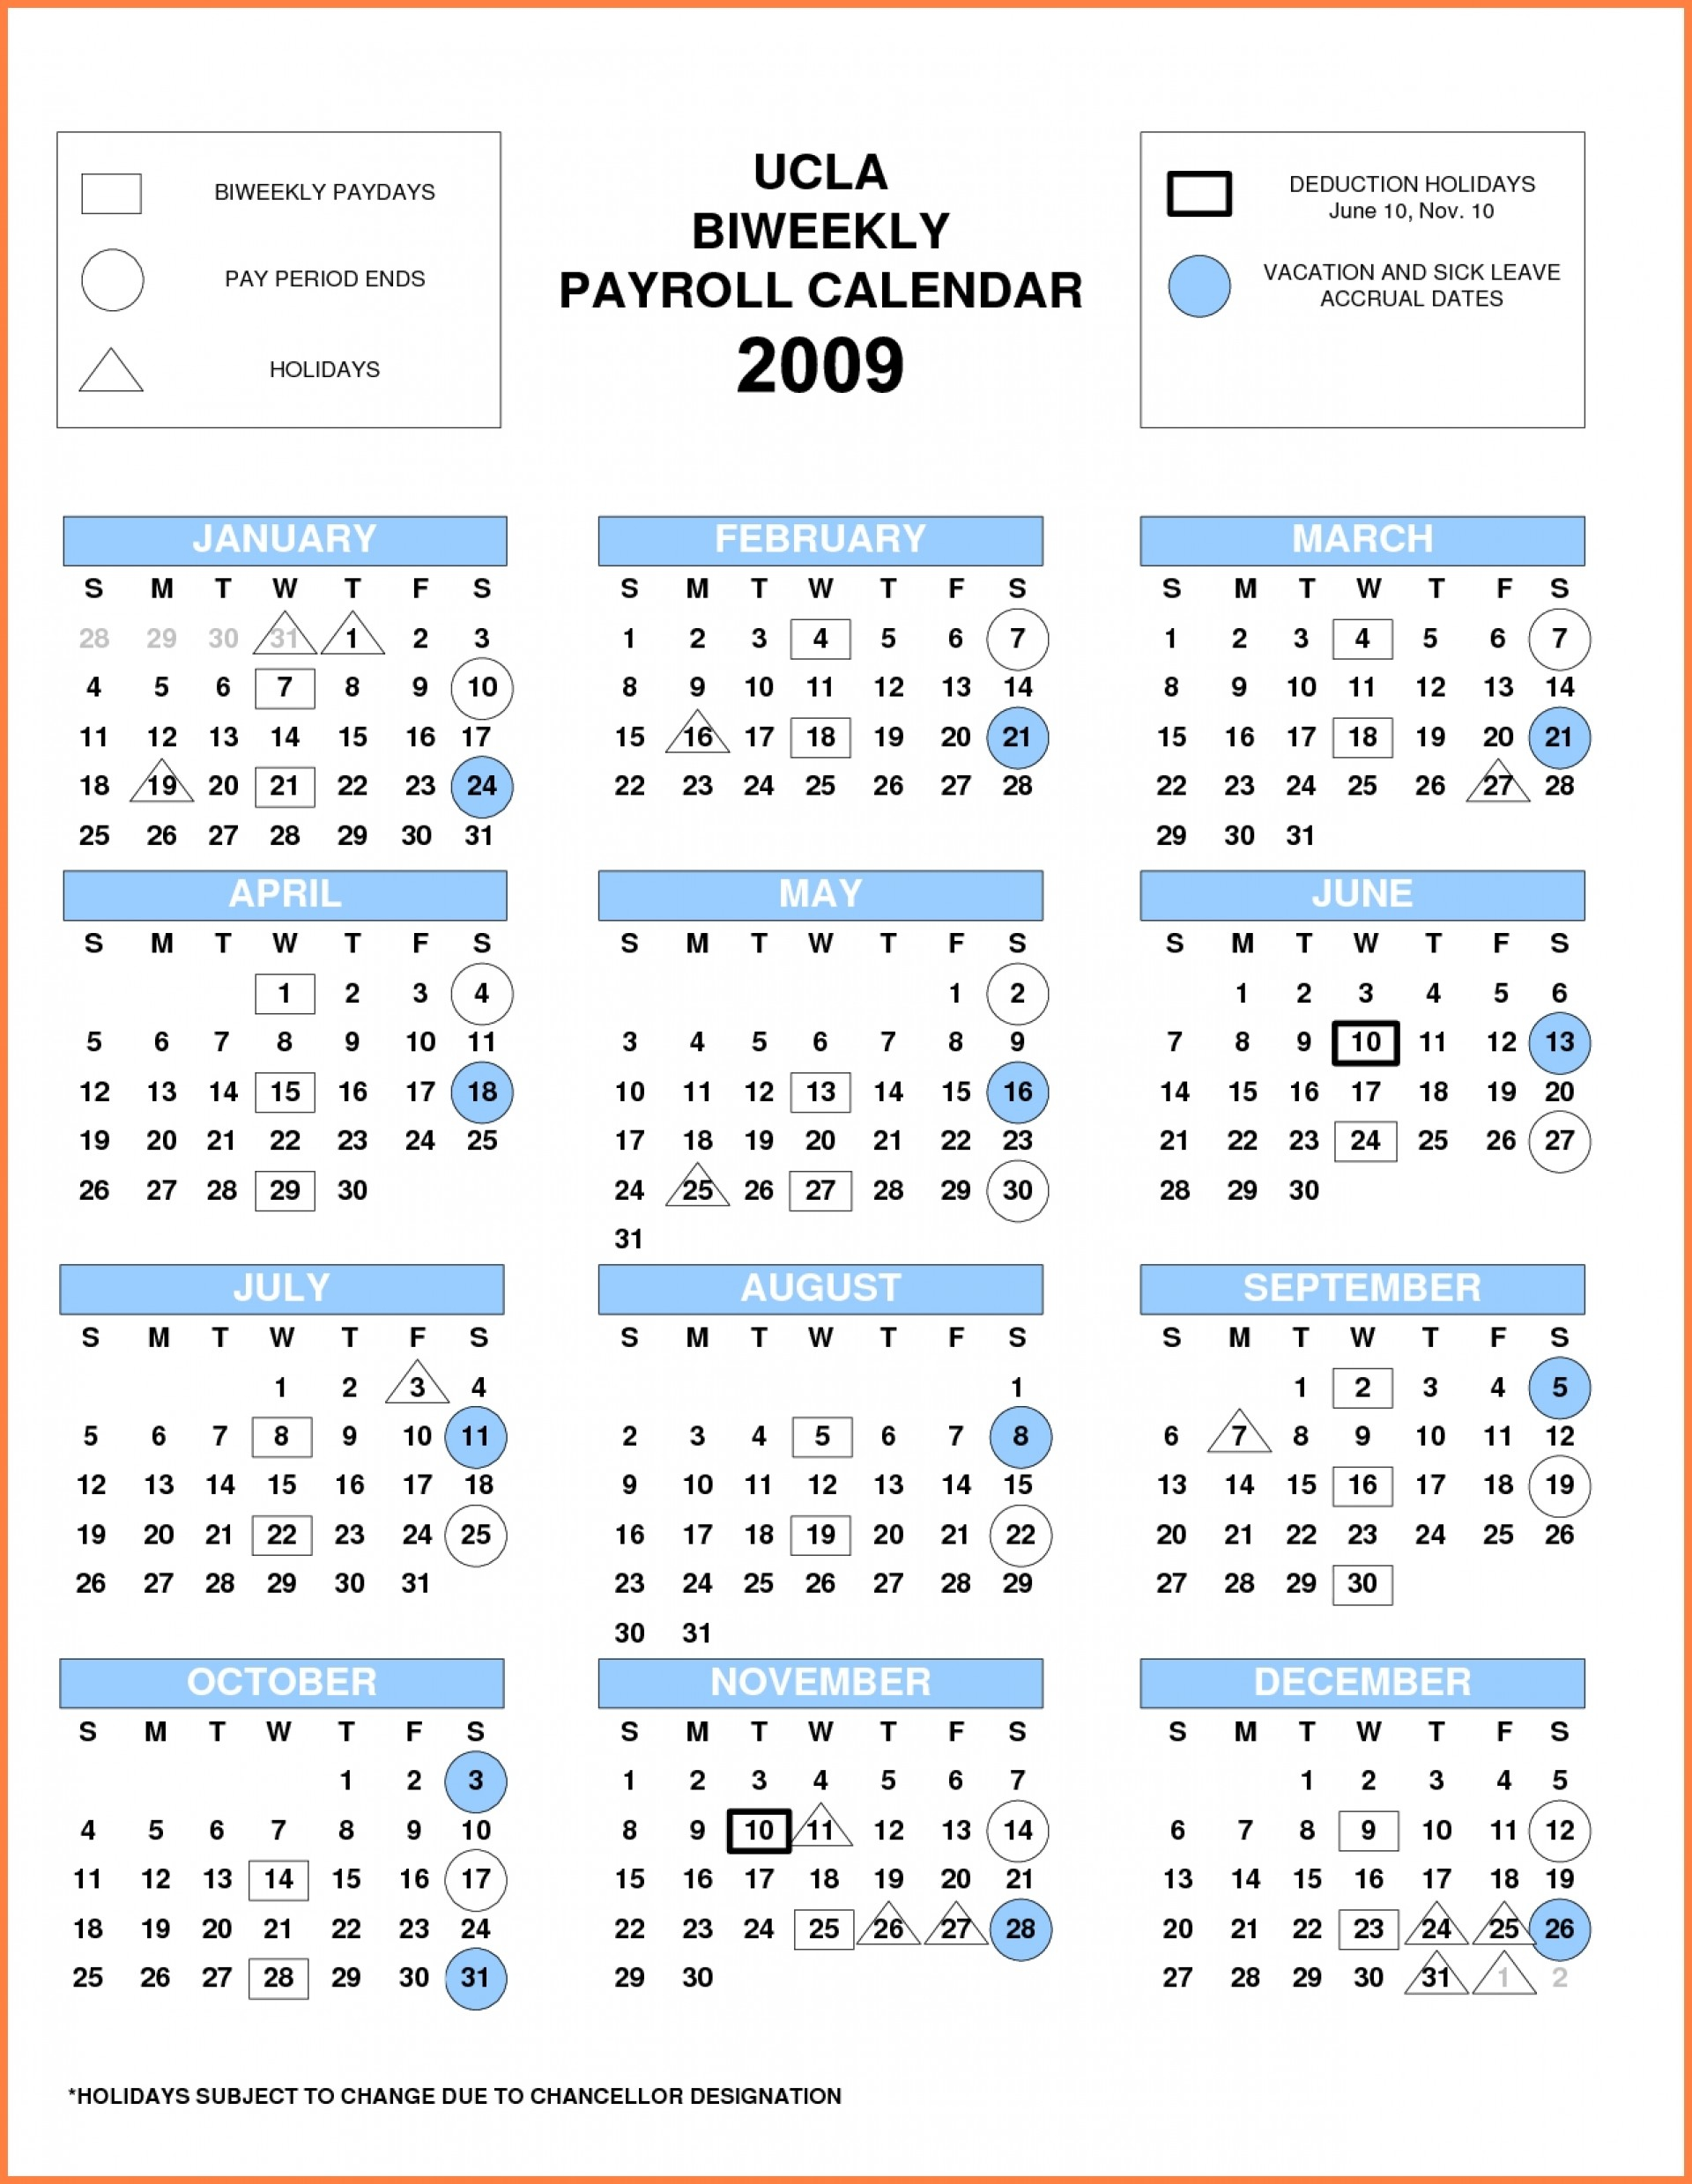 Uc Biweekly Payroll Calendar 2020 | Payroll Calendar 2021-2021Biweekly Payroll Calendar Template